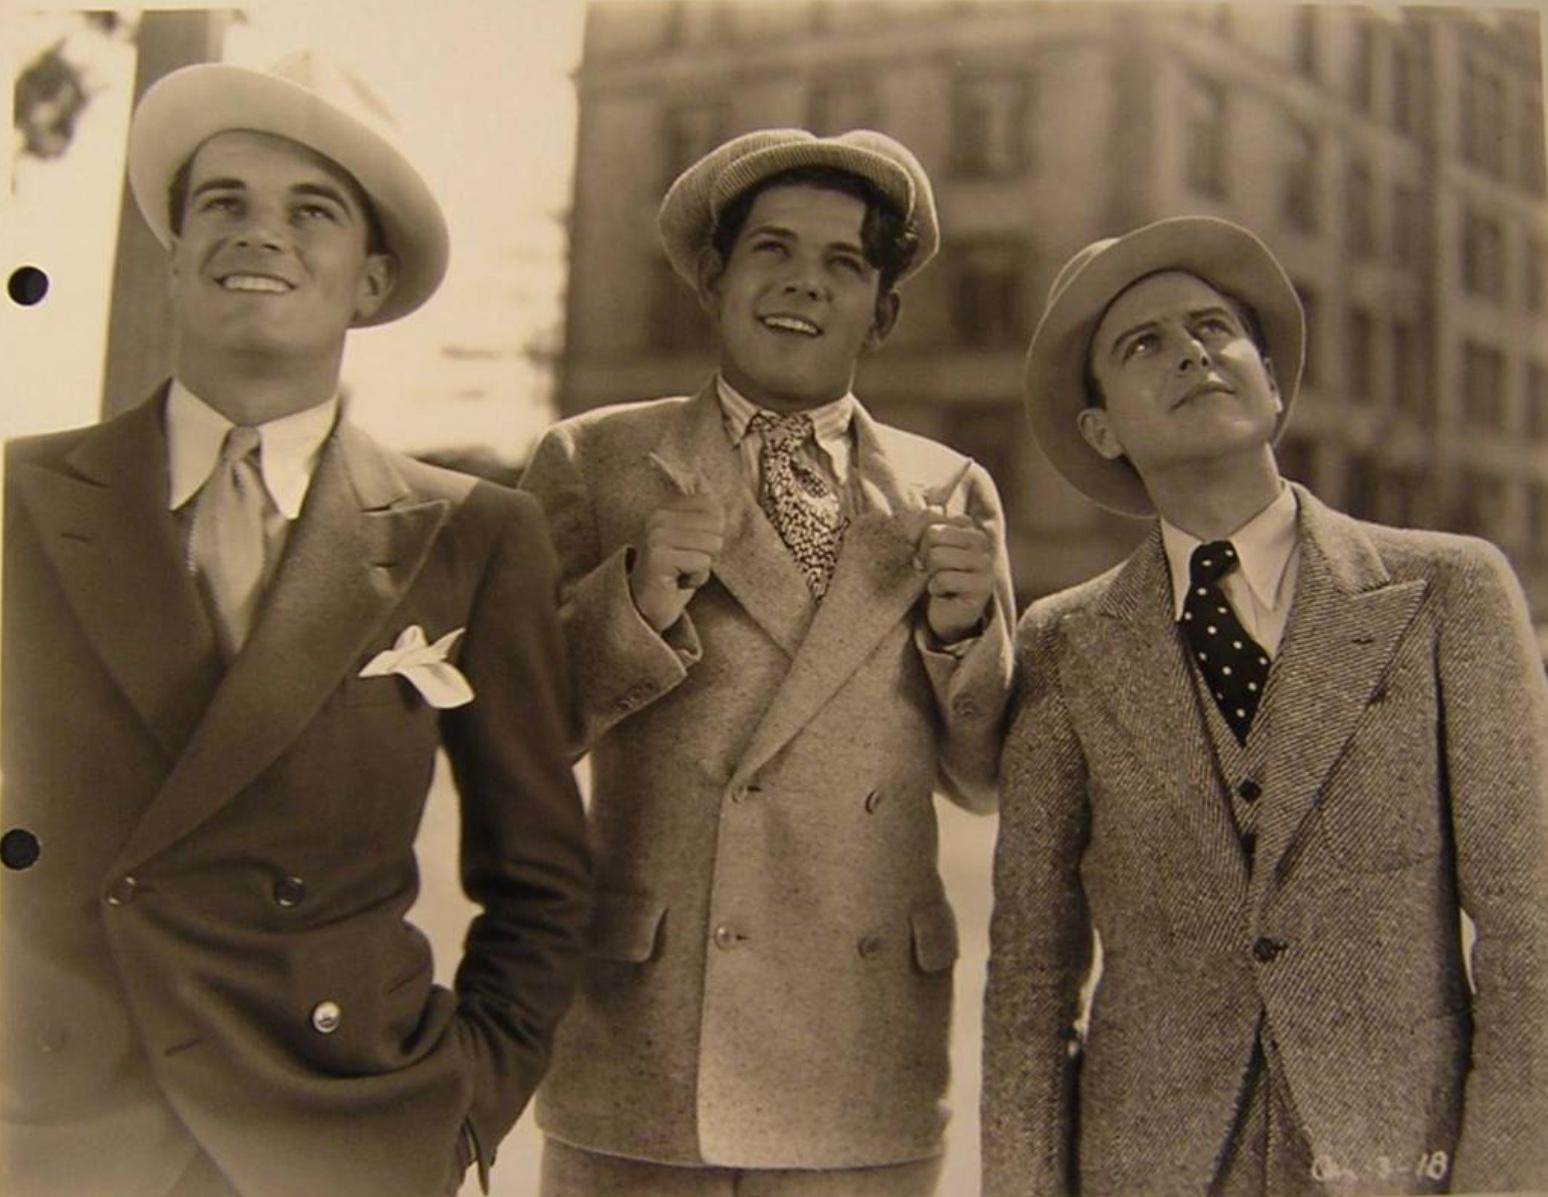 Richard Keene, David Rollins, and Nick Stuart in Why Leave Home? (1929)